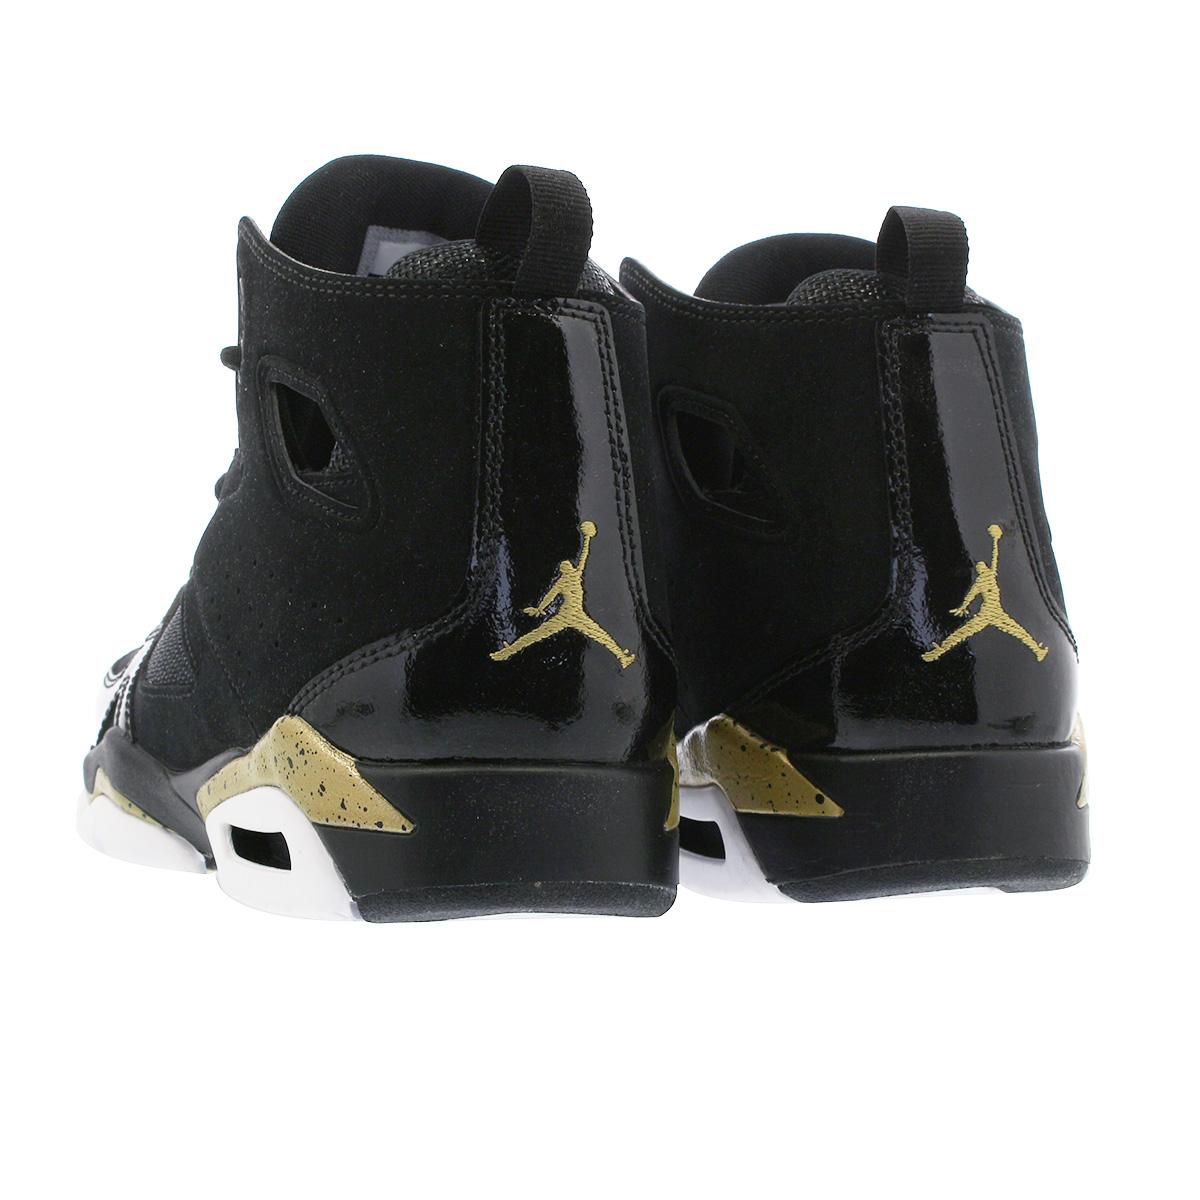 37c13b9453e77f NIKE JORDAN FLIGHT CLUB 91 GS Nike Jordan flight club 91 GS BLACK GOLD WHITE  555